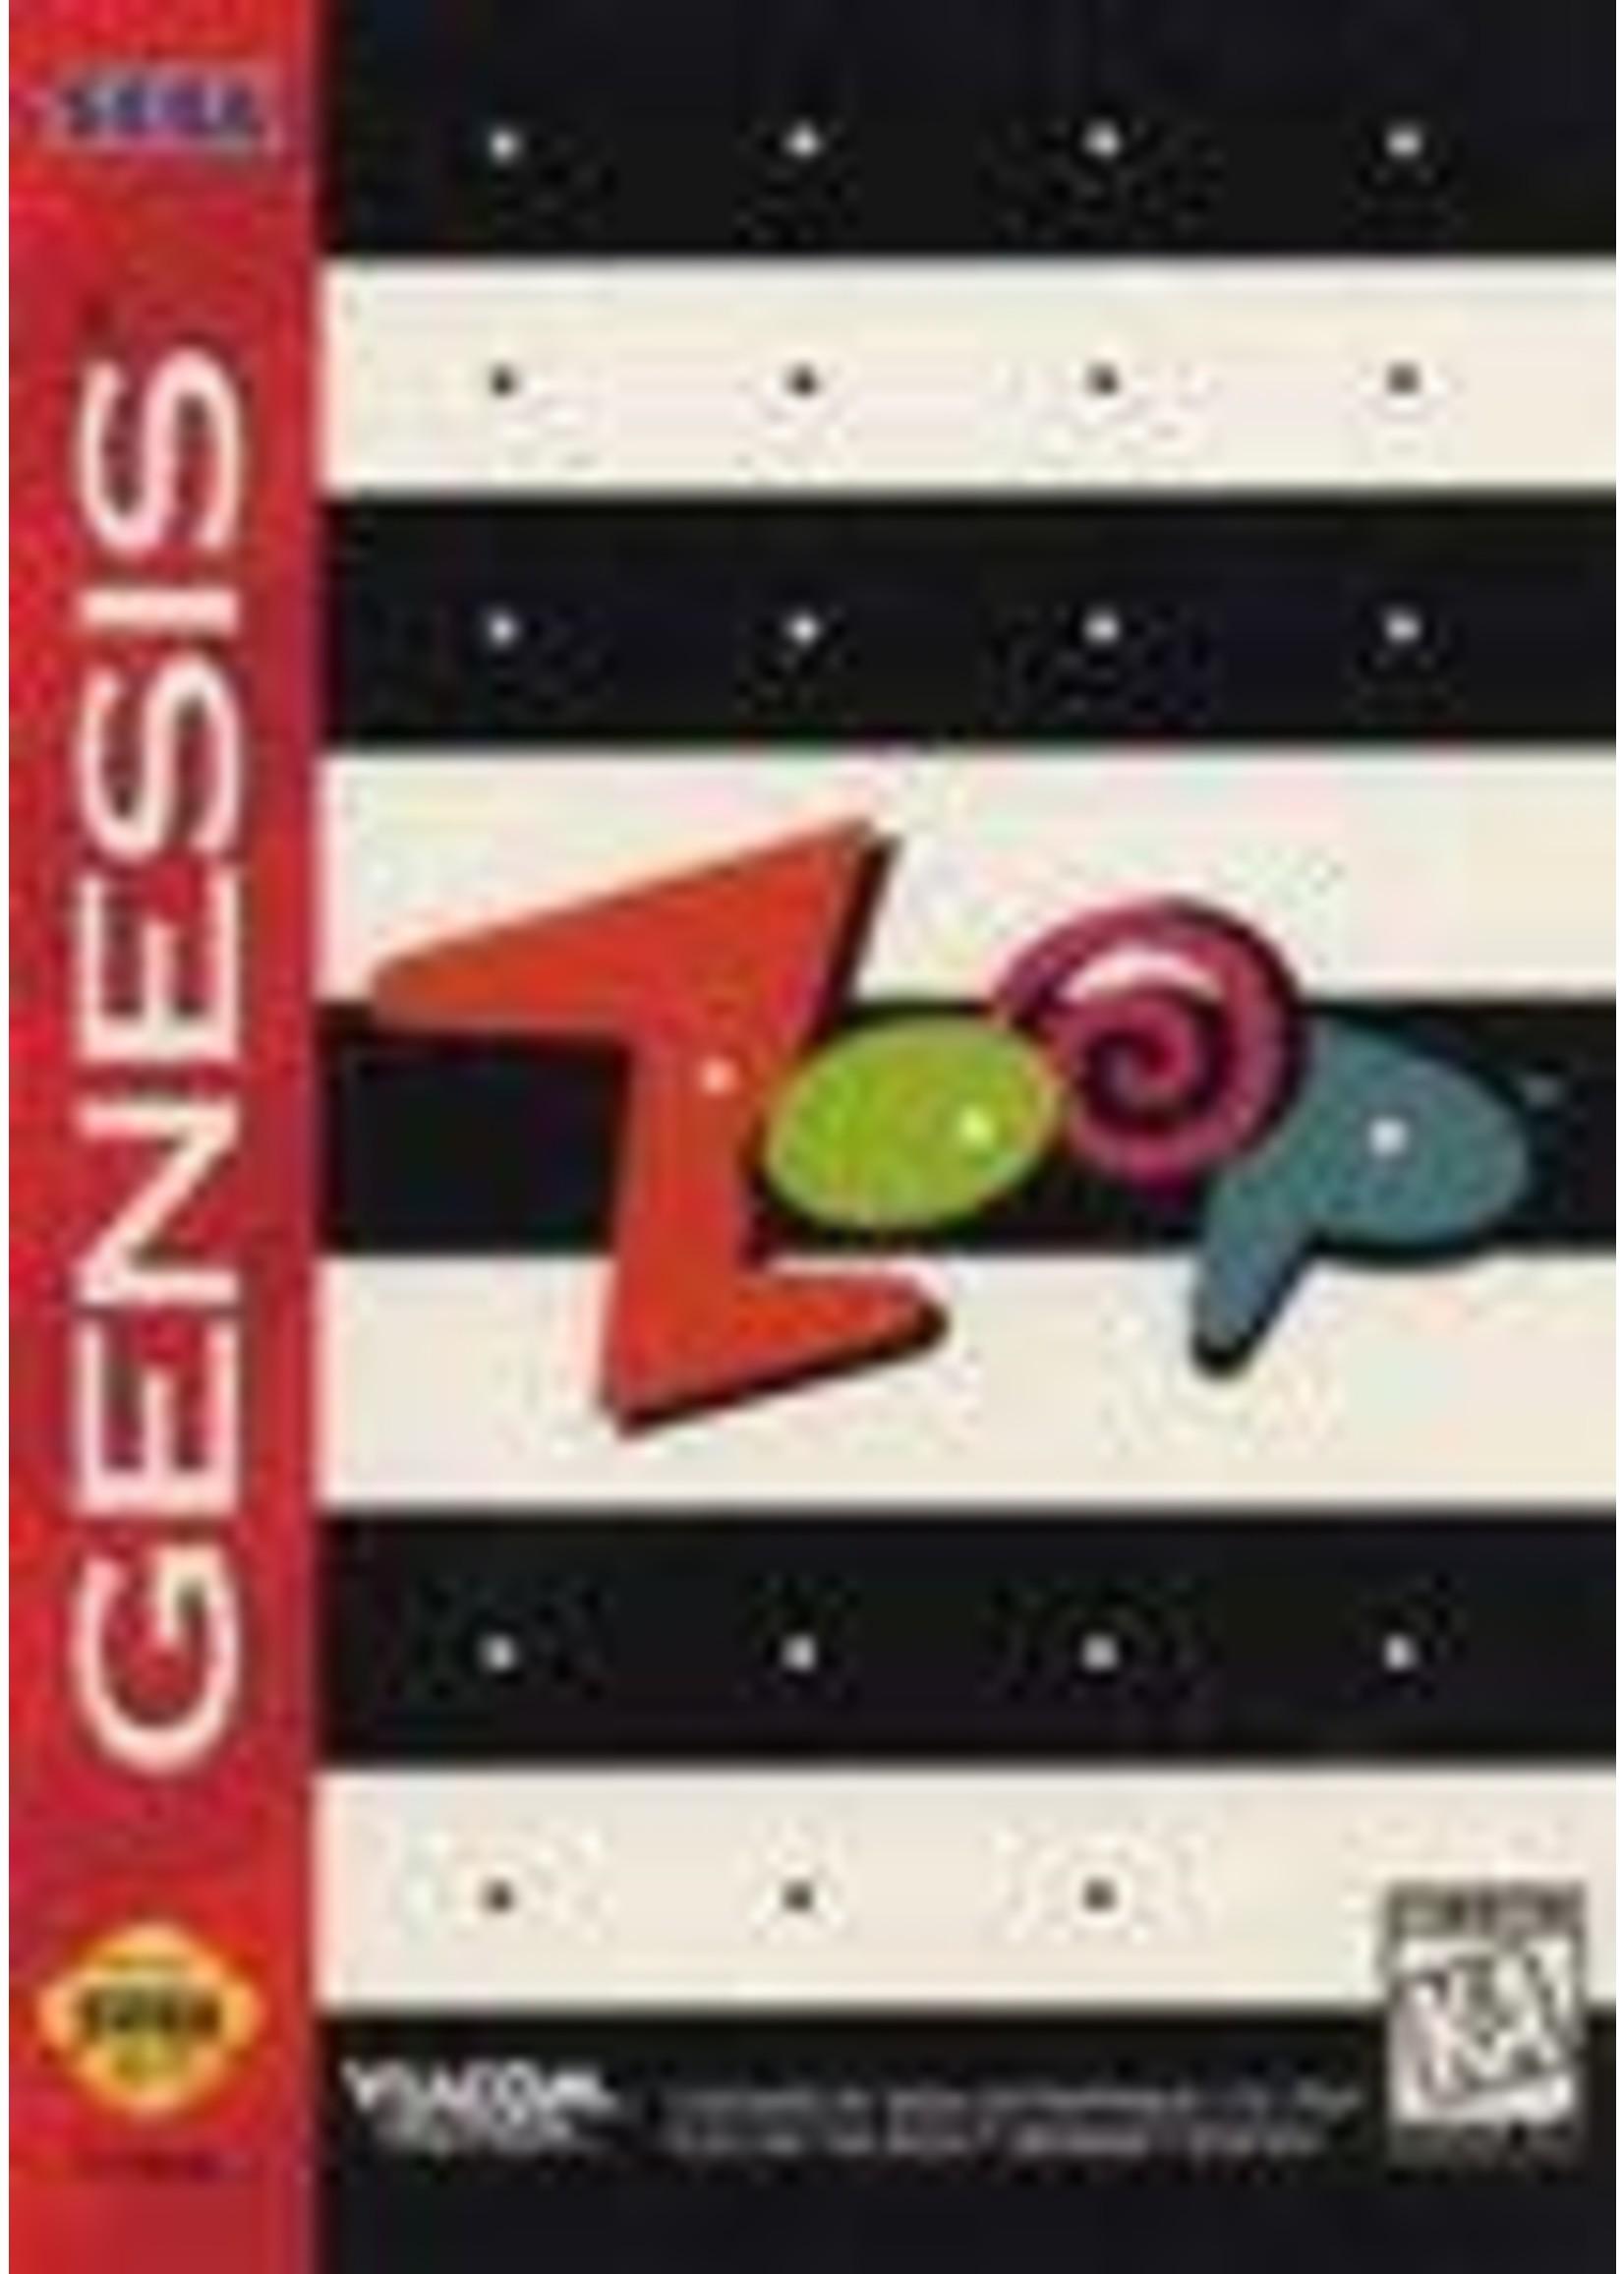 Zoop Sega Genesis